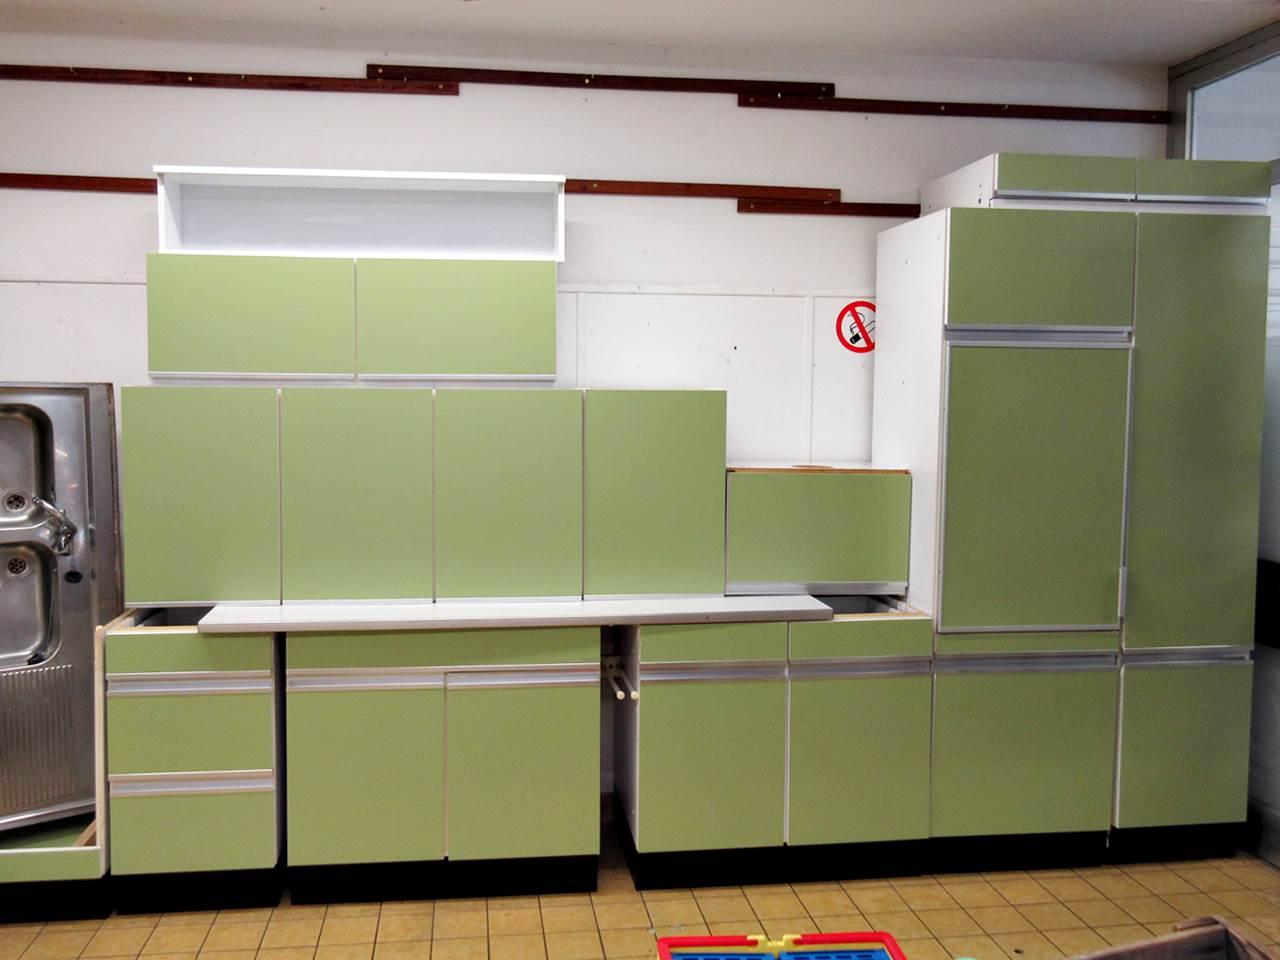 Retro Küche, Sofa, Kommoden, Stühle, Schränke | Trödel Oase ...